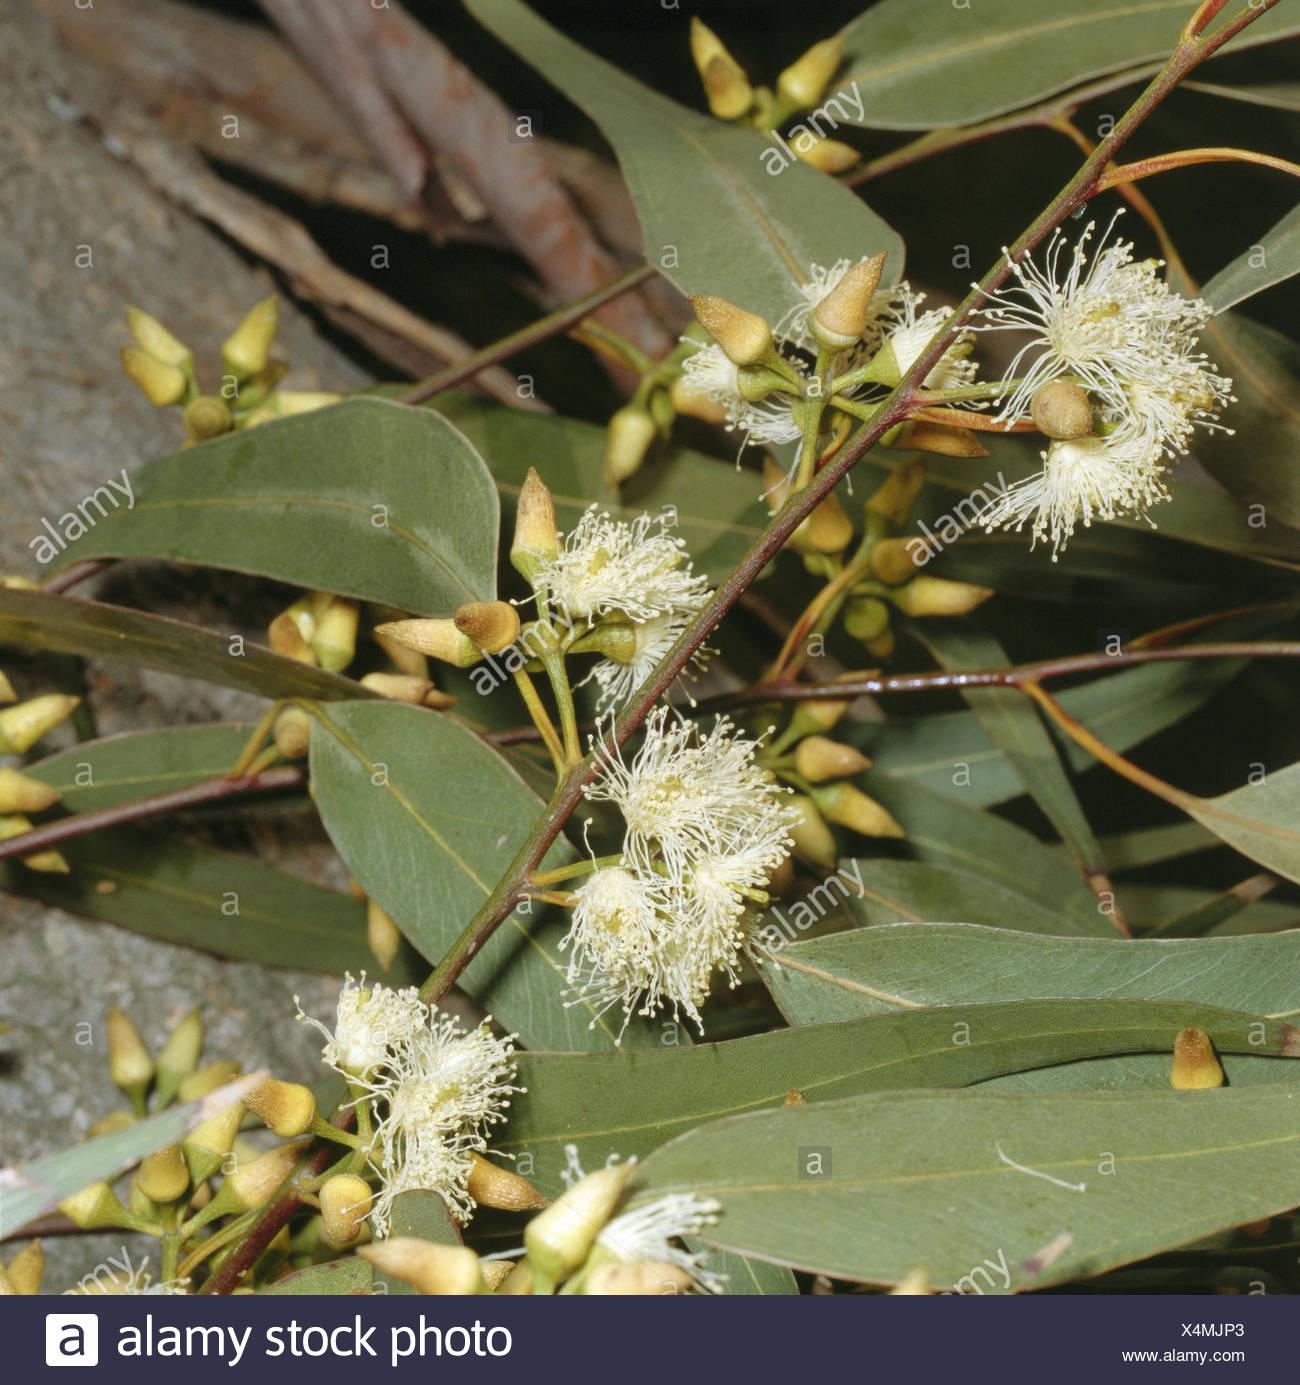 Eucalyptus eucalyptus globulus labill leaves blossoms close up nature botany flora fever gum tree eucalyptus globulus plant blossom leaves fig kind shrub blossom white blossoming flower flowers leaves mightylinksfo